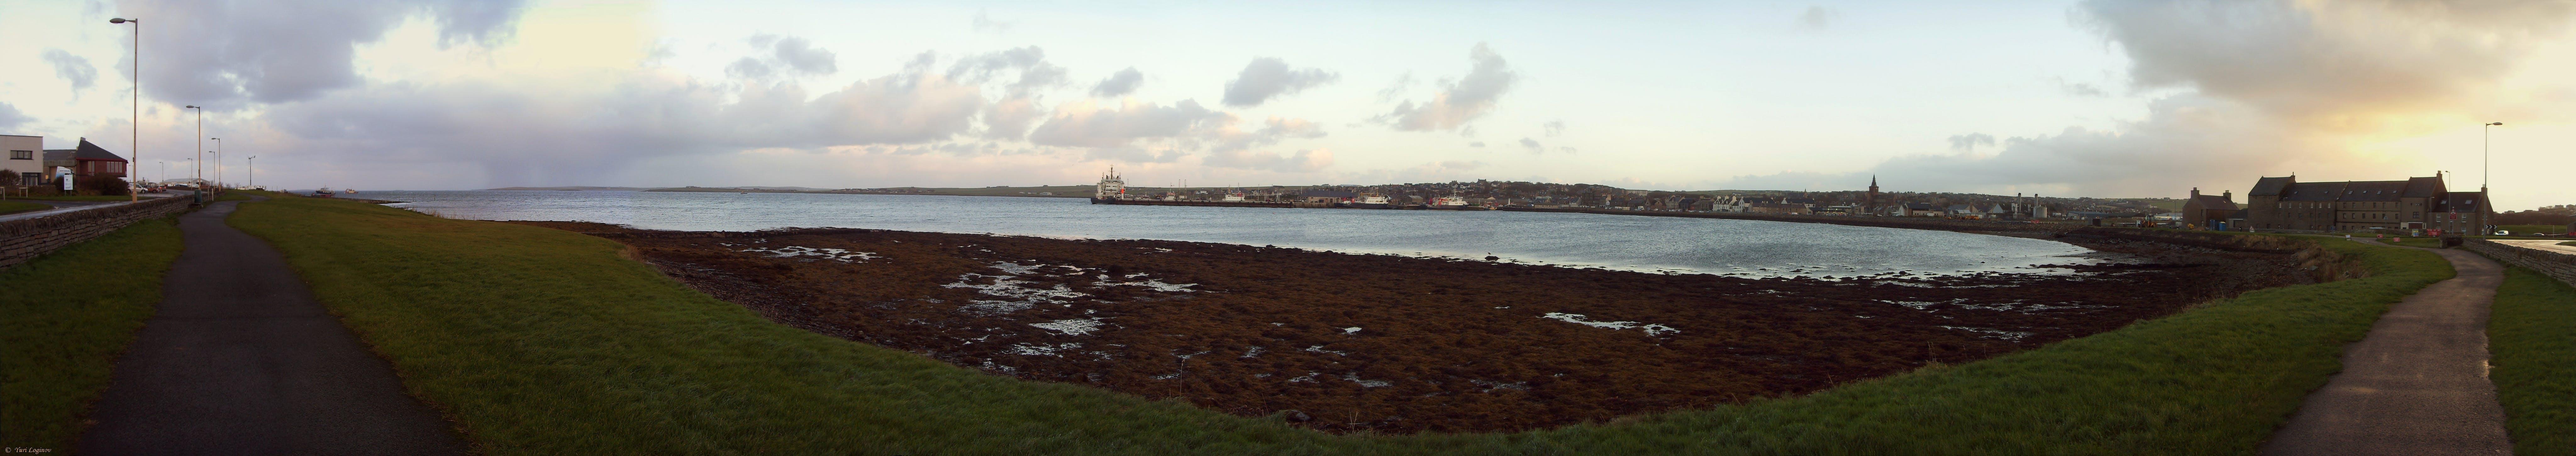 Free stock photo of scotland, united kingdom, orkney, Kirkwall